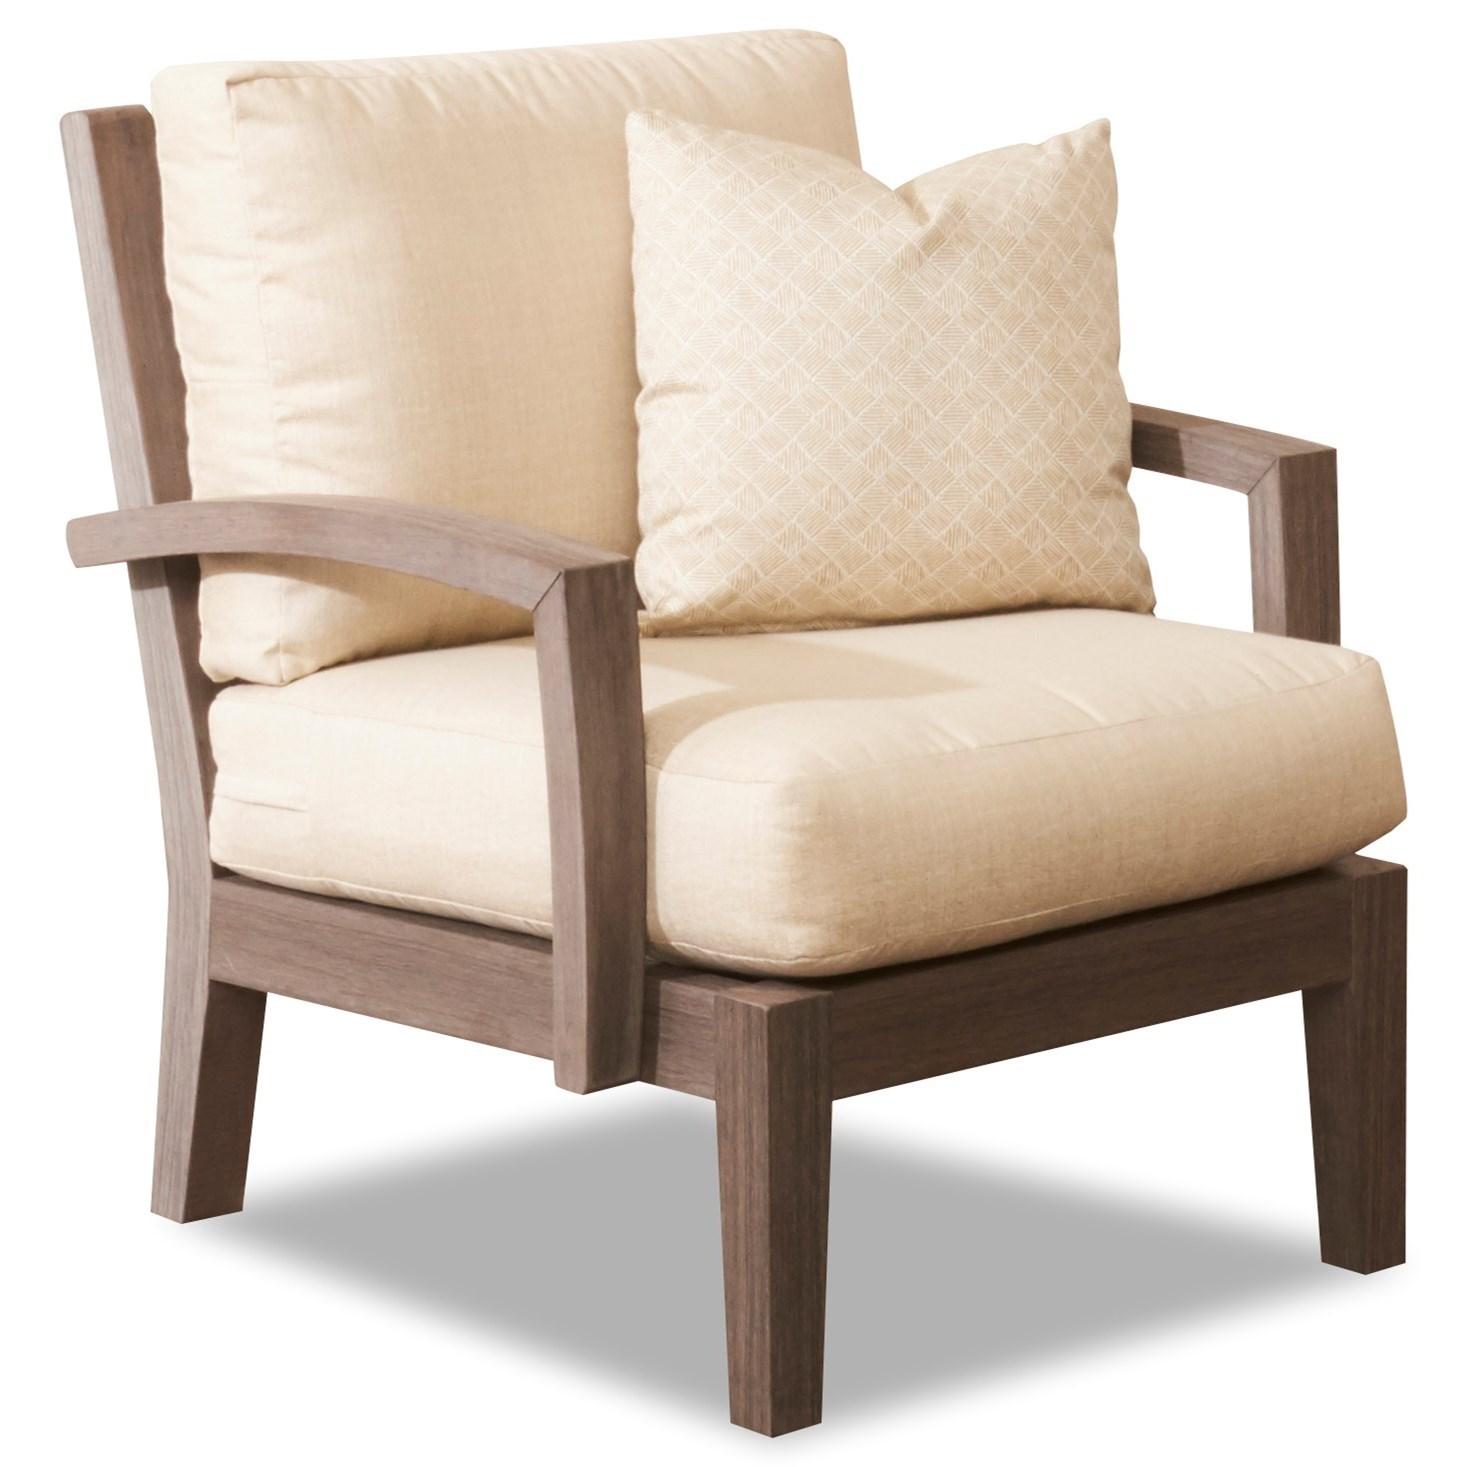 Sierra Outdoor Chair by Klaussner Outdoor at Nassau Furniture and Mattress